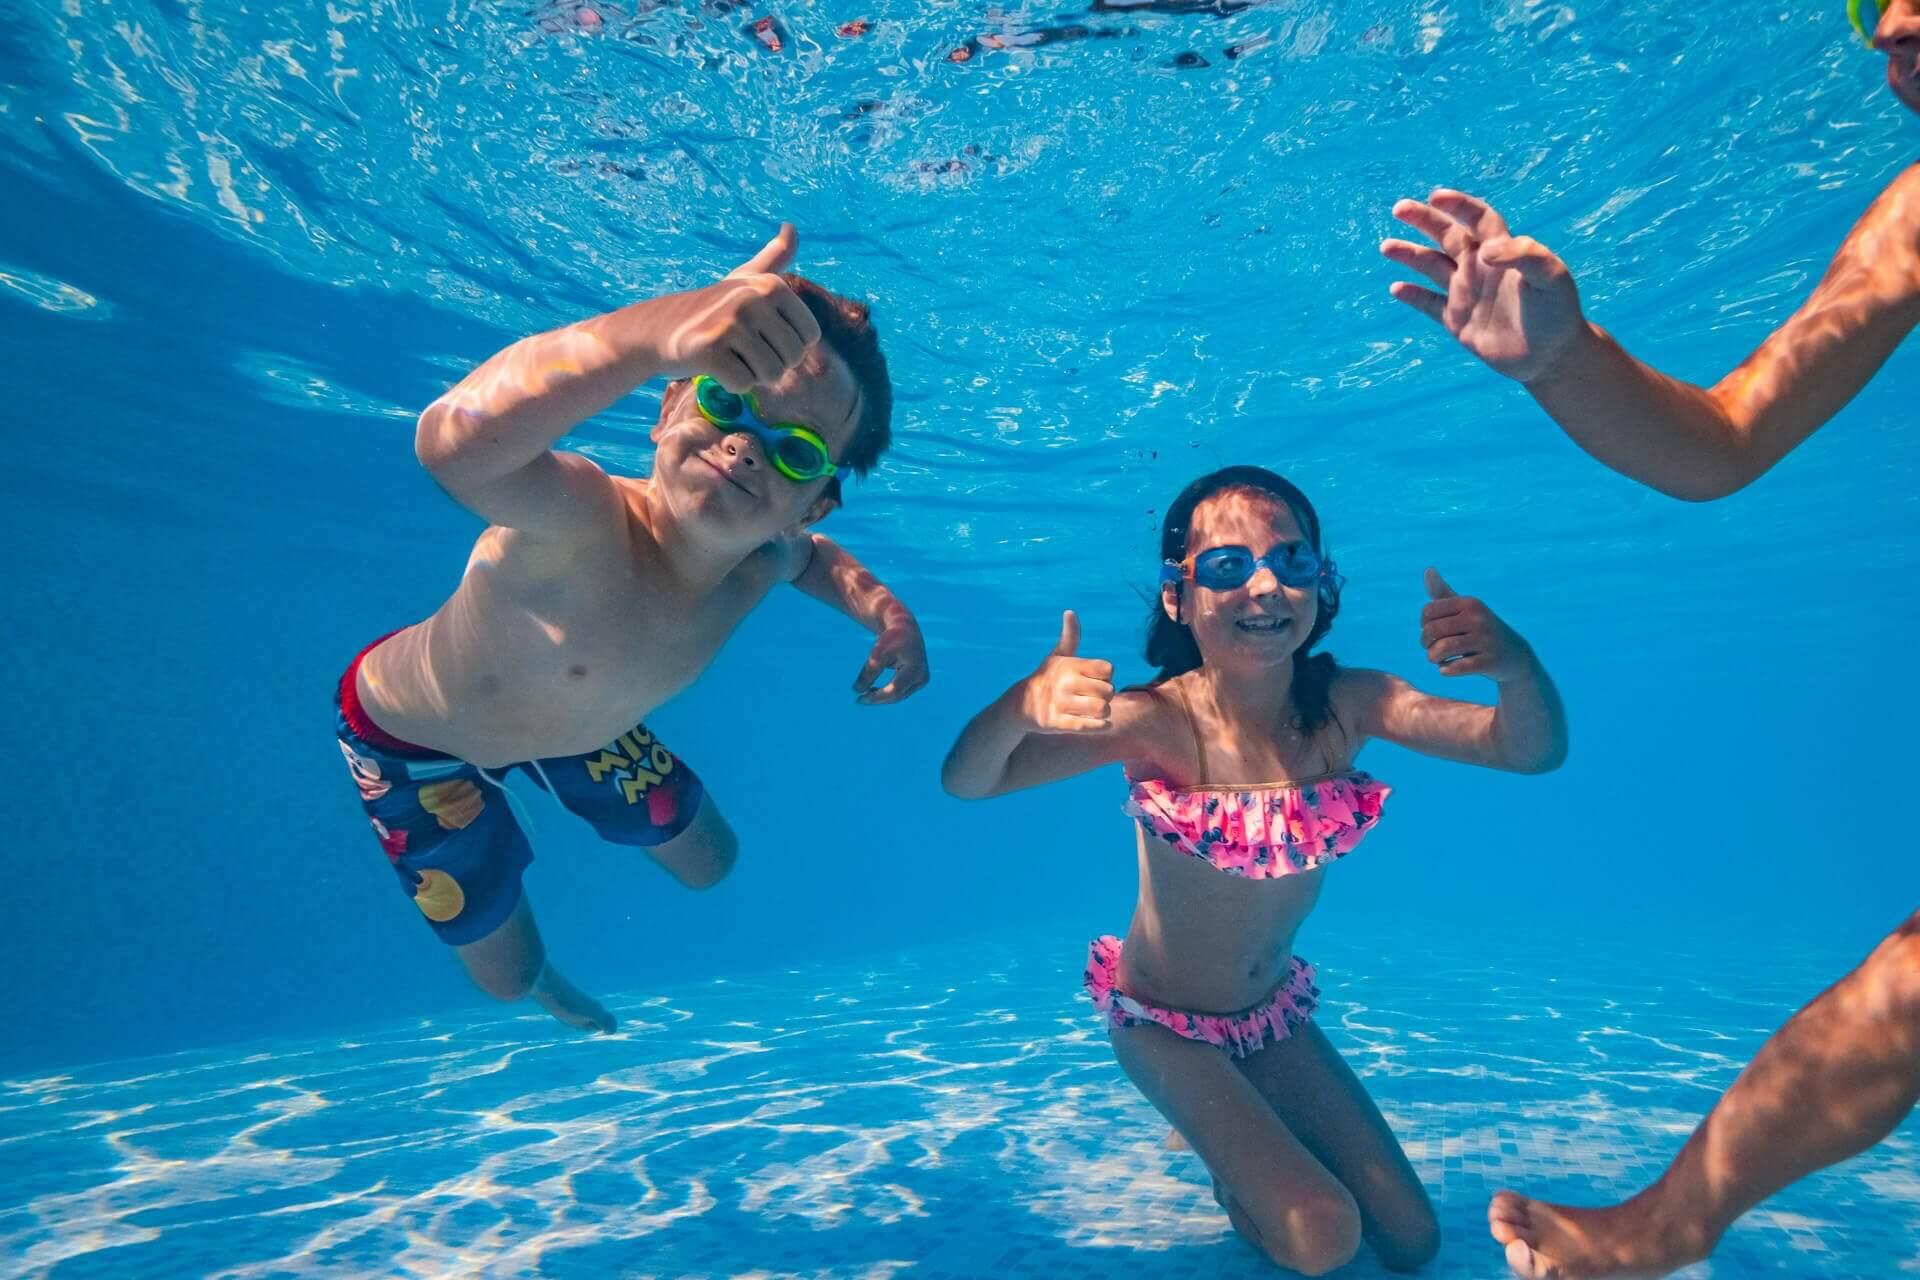 underwater photo in swimming pool